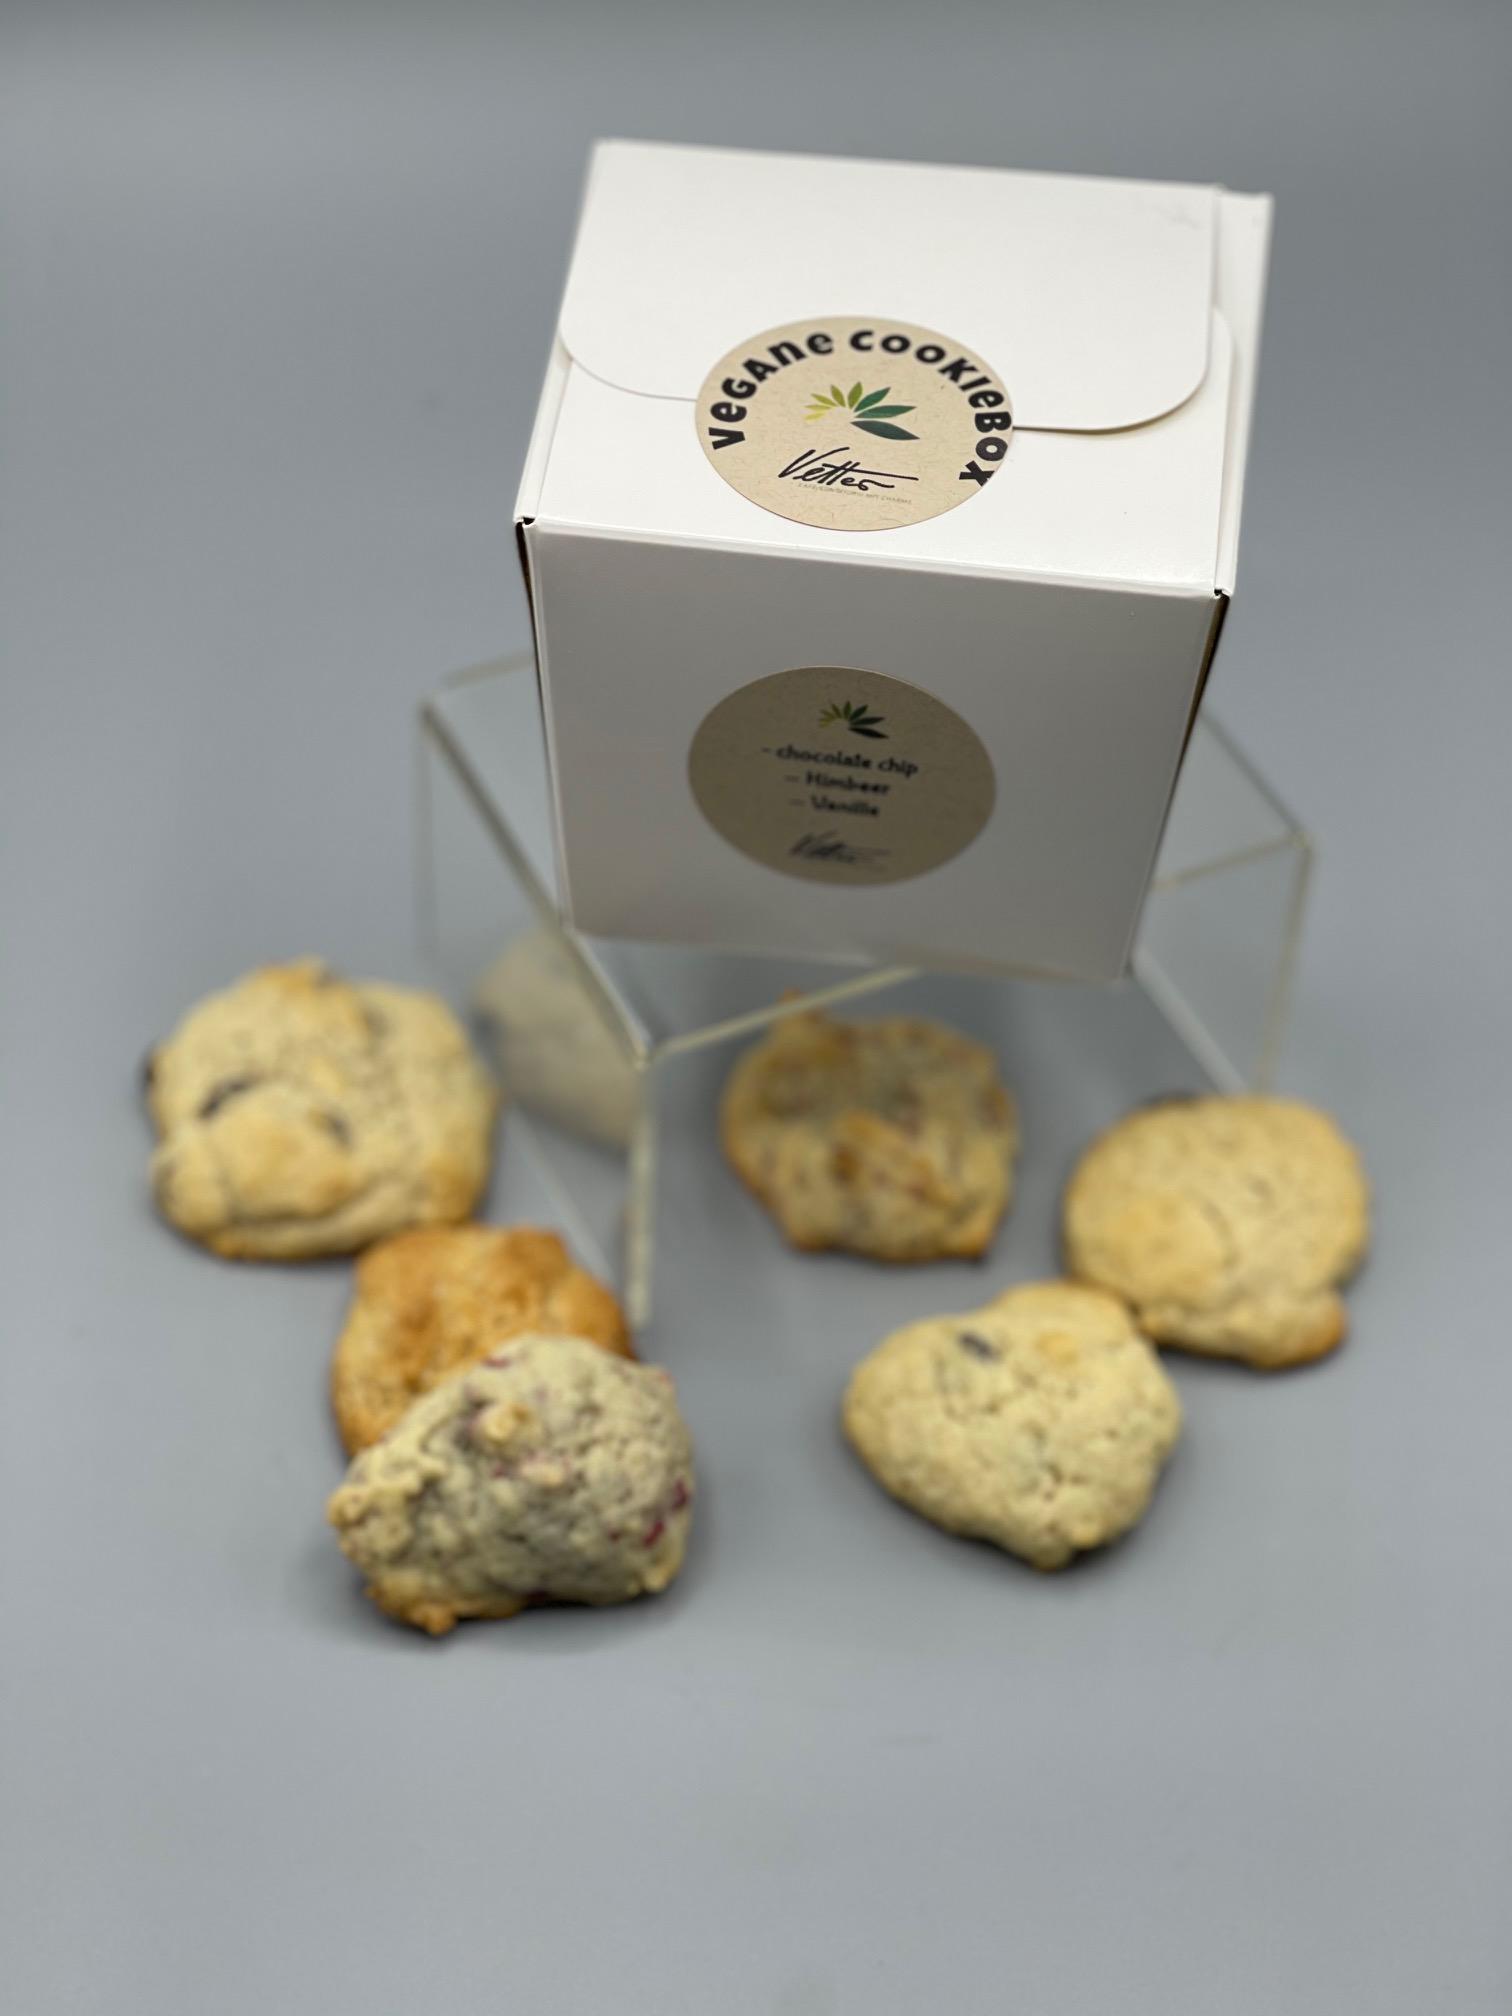 Vegane Cookiebox